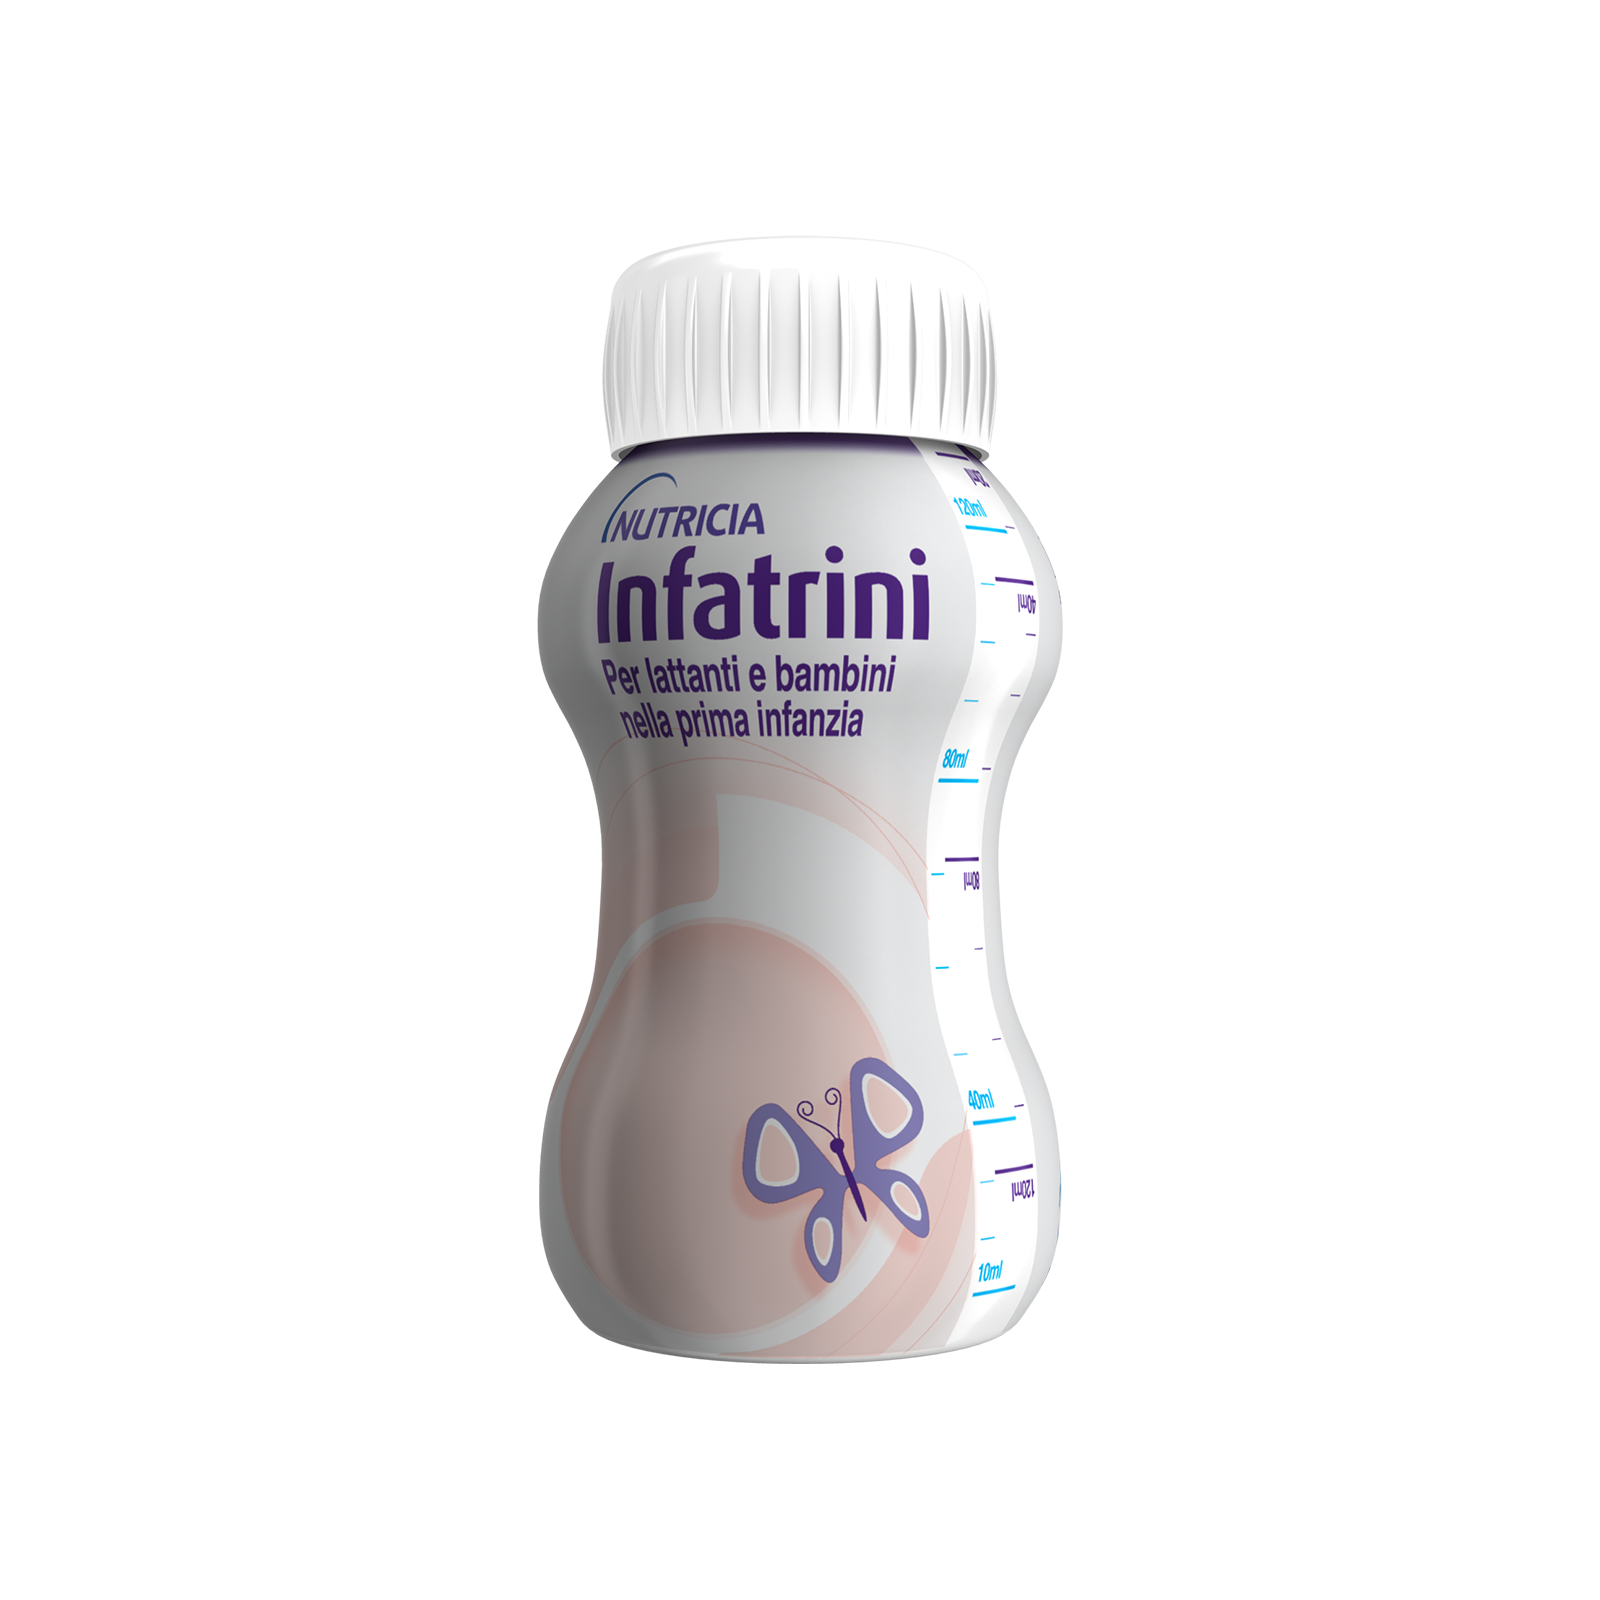 Infatrini gusto neutro 192x Bottiglietta 125 ml | Nutricia